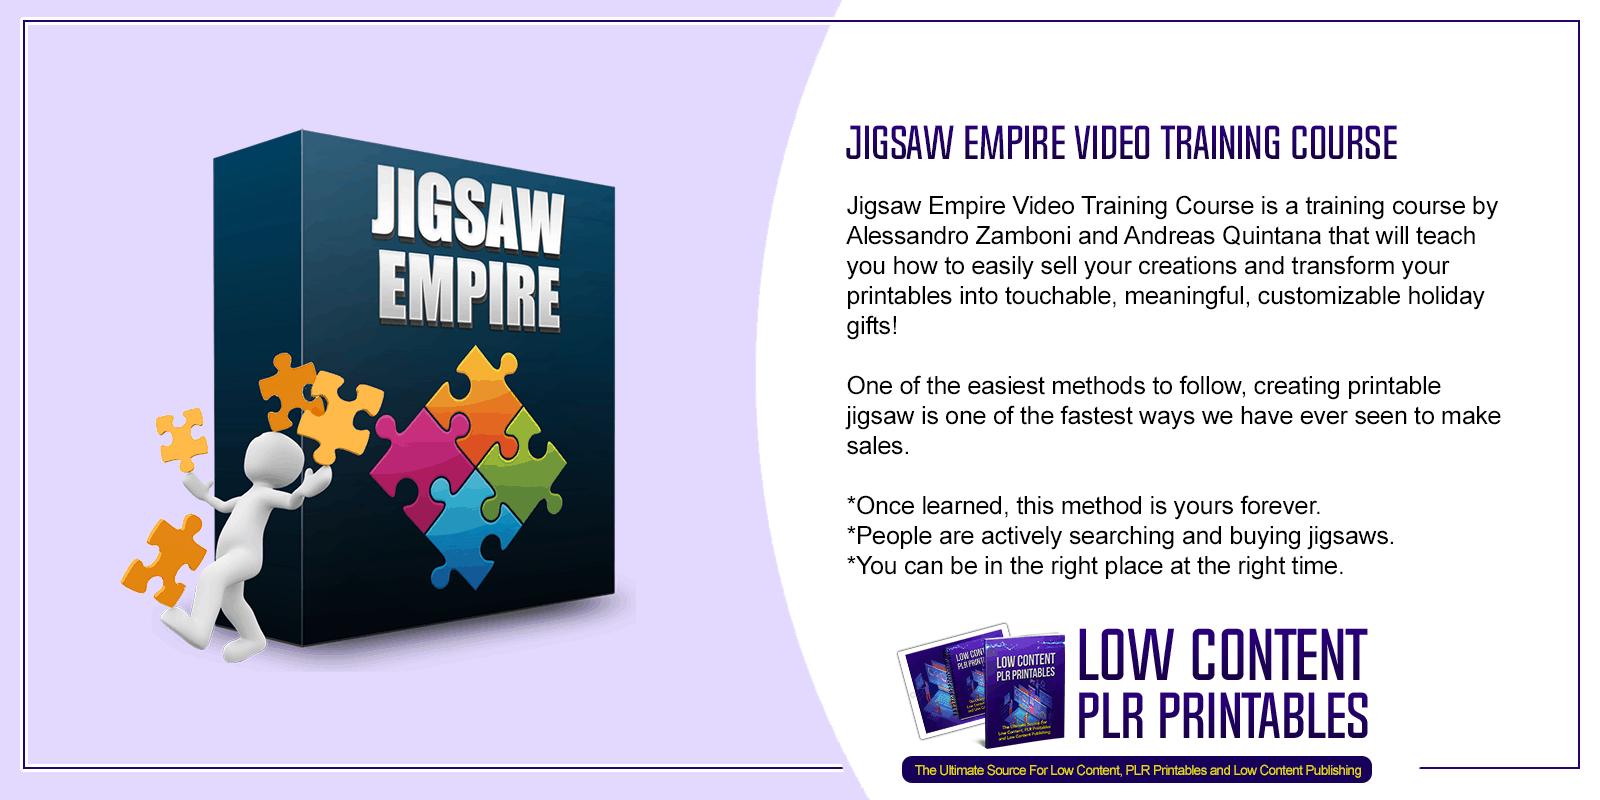 Jigsaw Empire Video Training Course